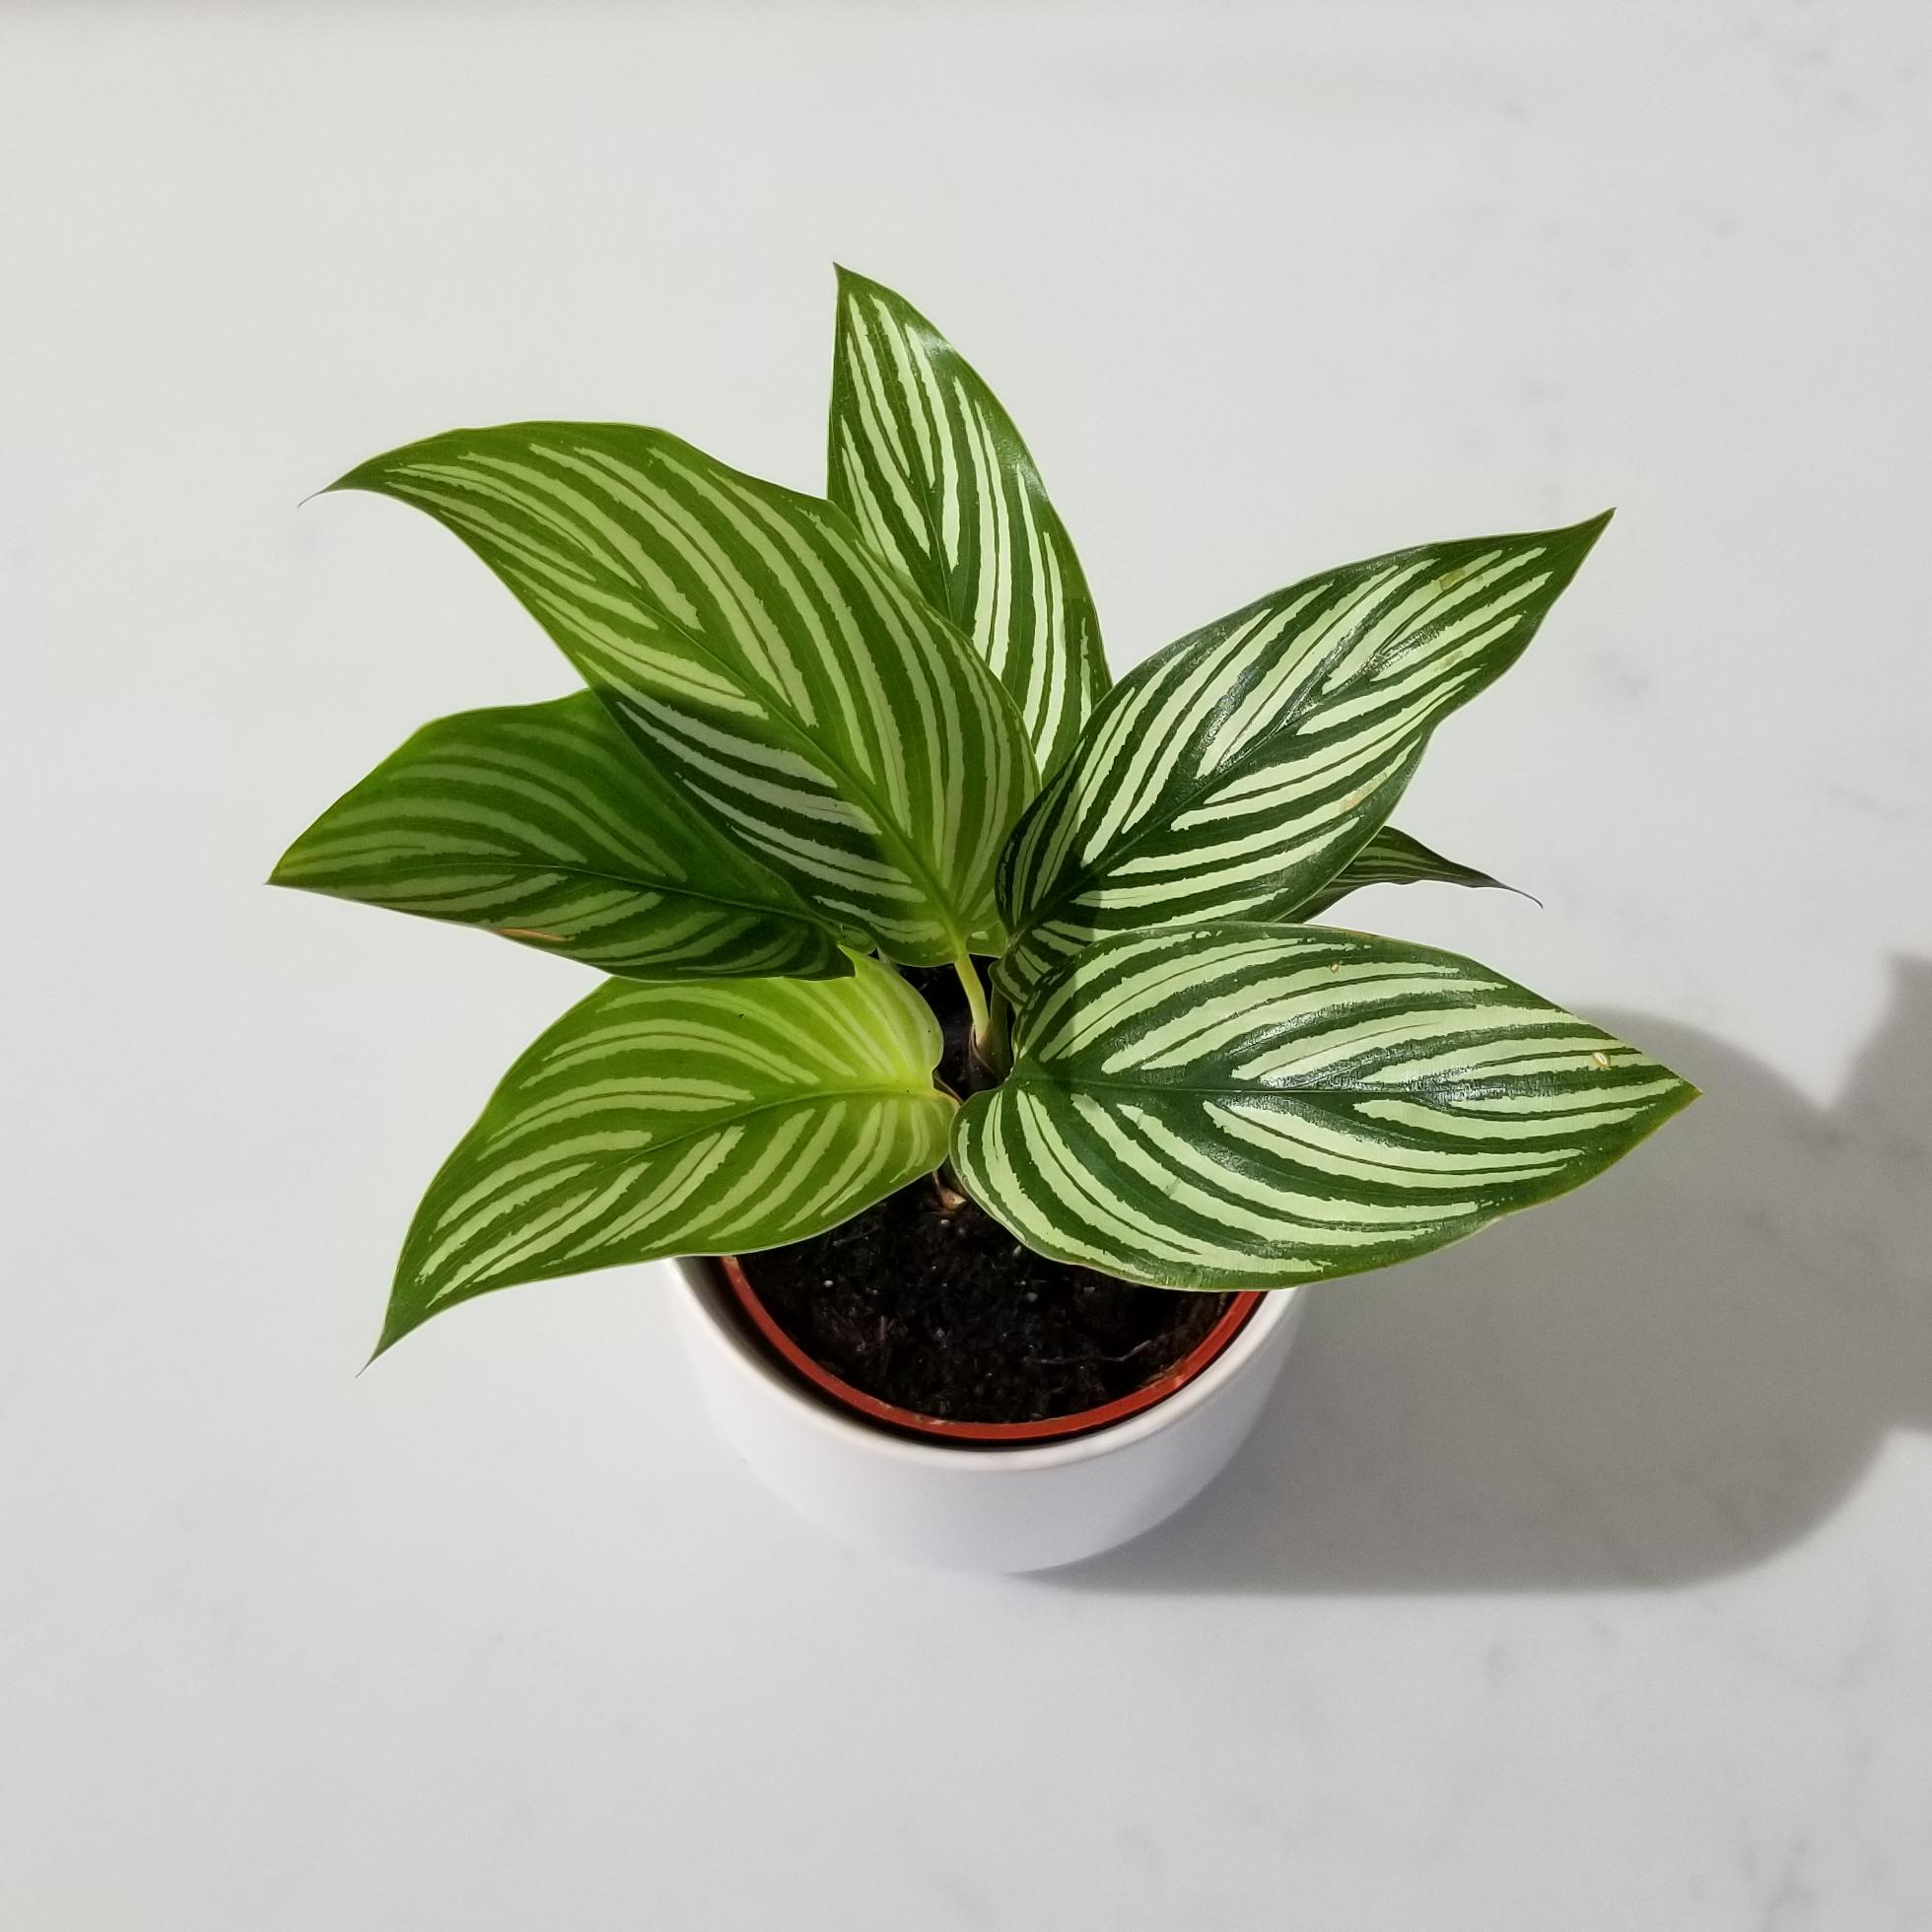 Indoor plants houseplants green plants for indoors interiorplants Plant shop GTA Mississauga Toronto Etobicoke Brampton Grimsby Burlington Oakville Hamilton Calathea vittata